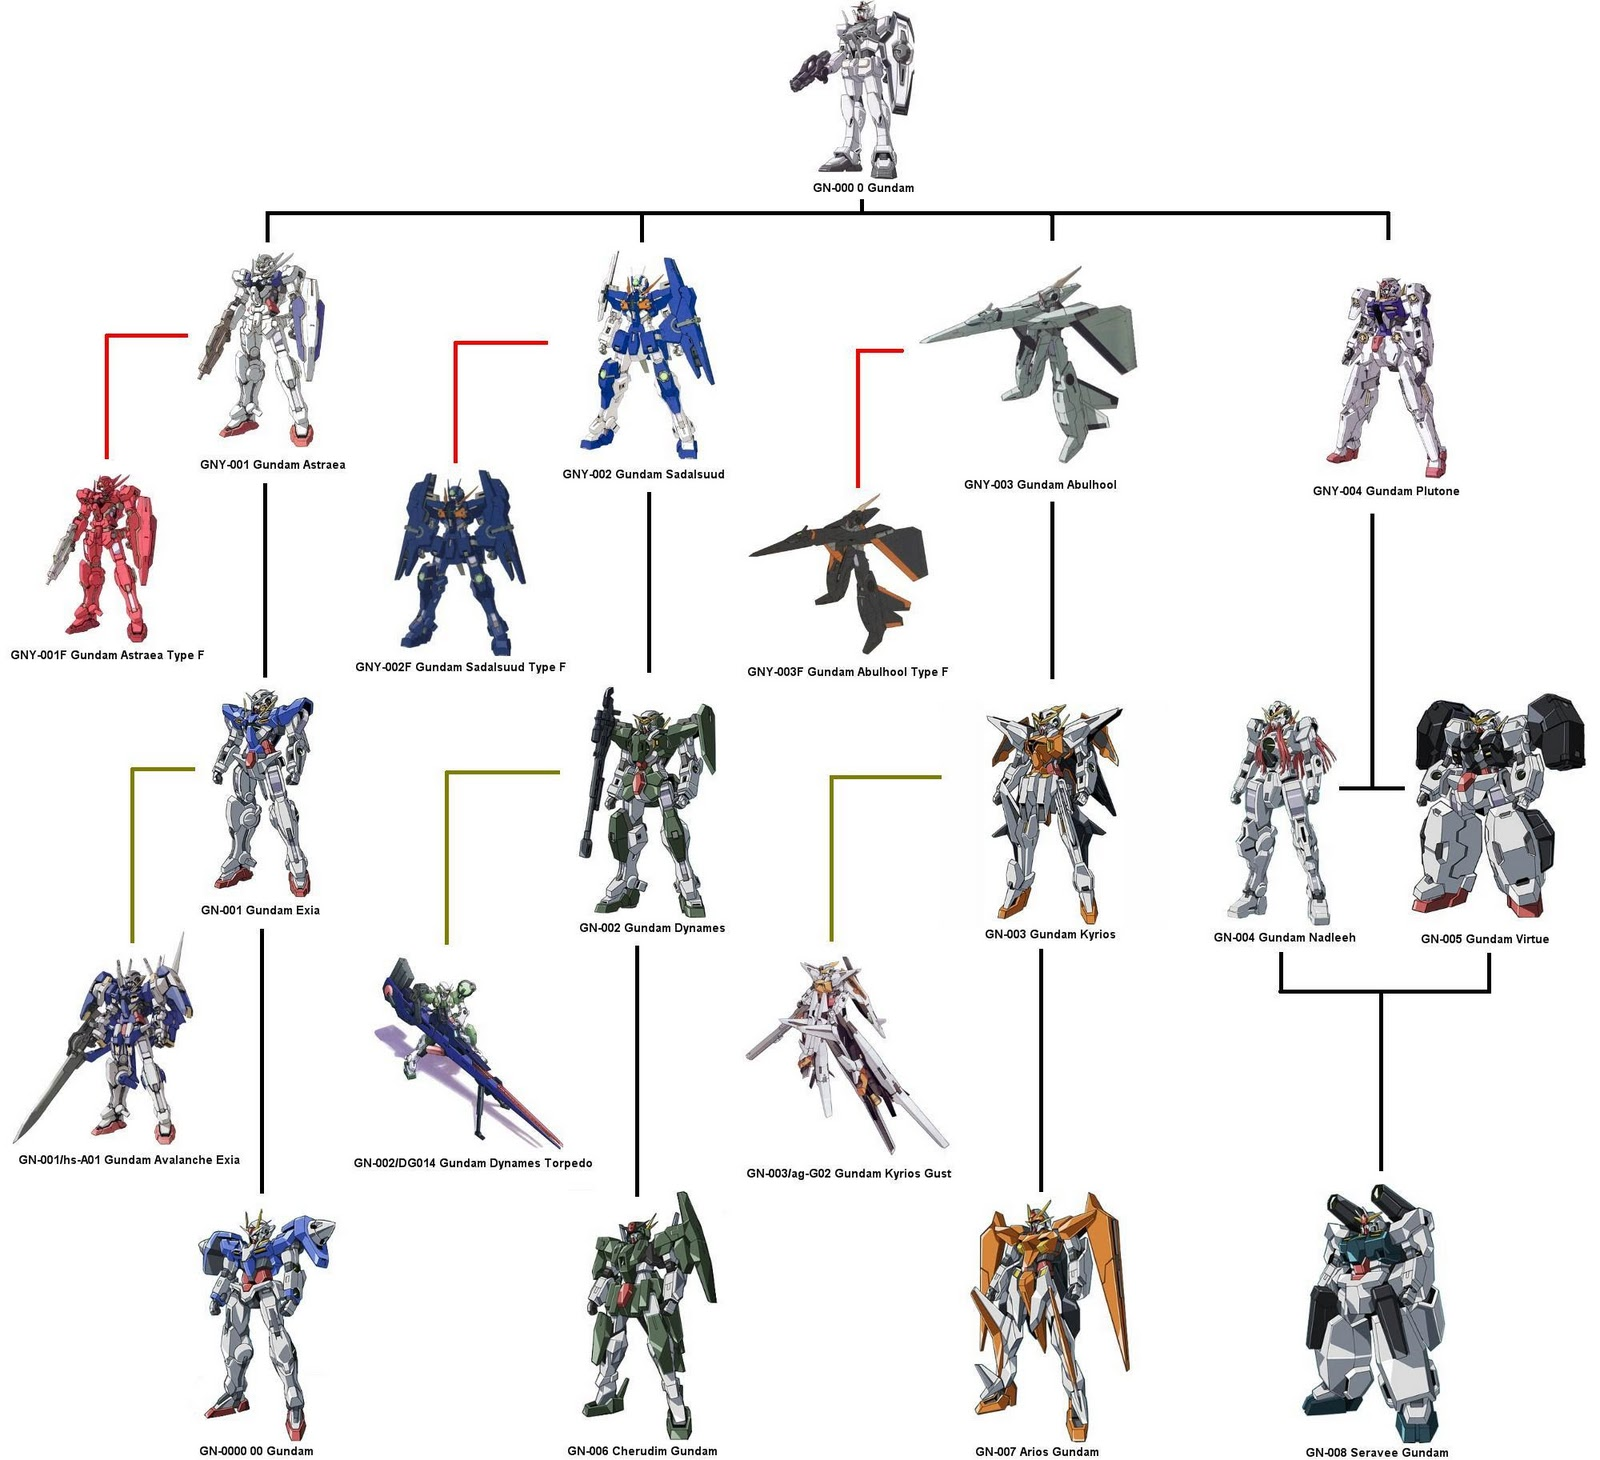 http://3.bp.blogspot.com/_AFPNTdm5dSw/TQ7F7cXpxXI/AAAAAAAAABo/ujn4vL61ma0/s1600/Gundam_00_Celestial_Being_Tree_by_ZeroBloodyRose.jpg